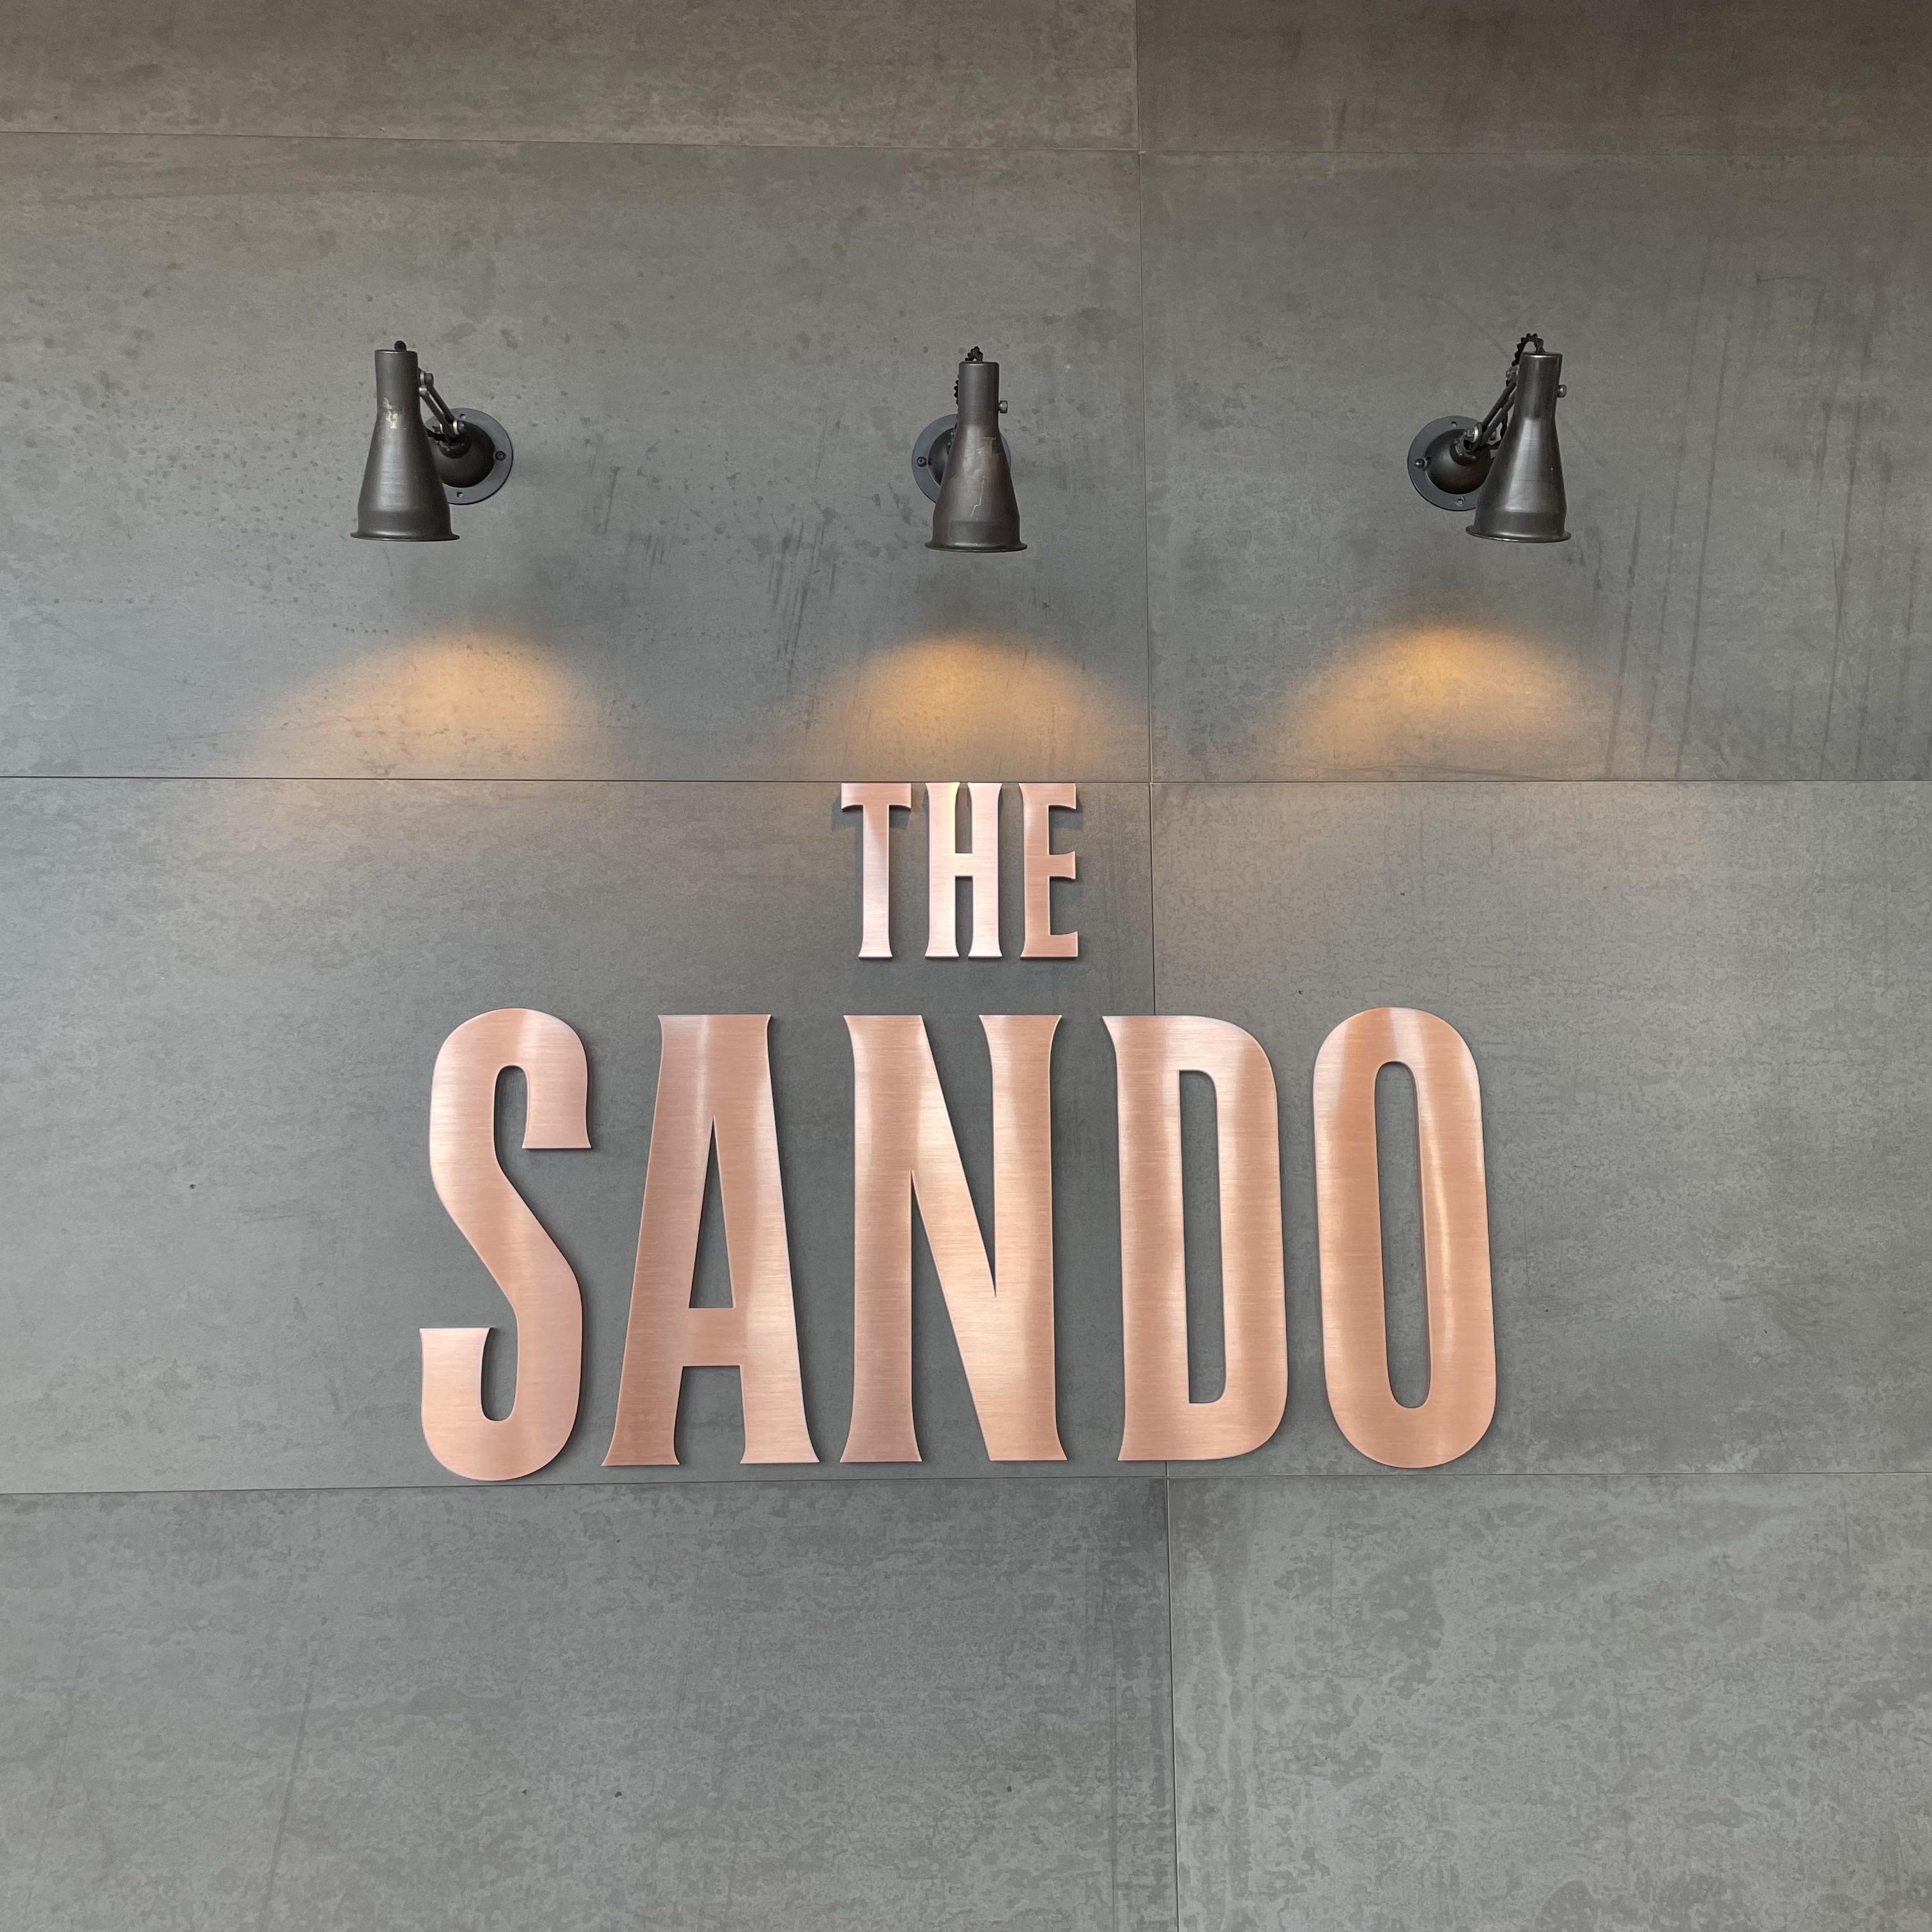 THE SANDO